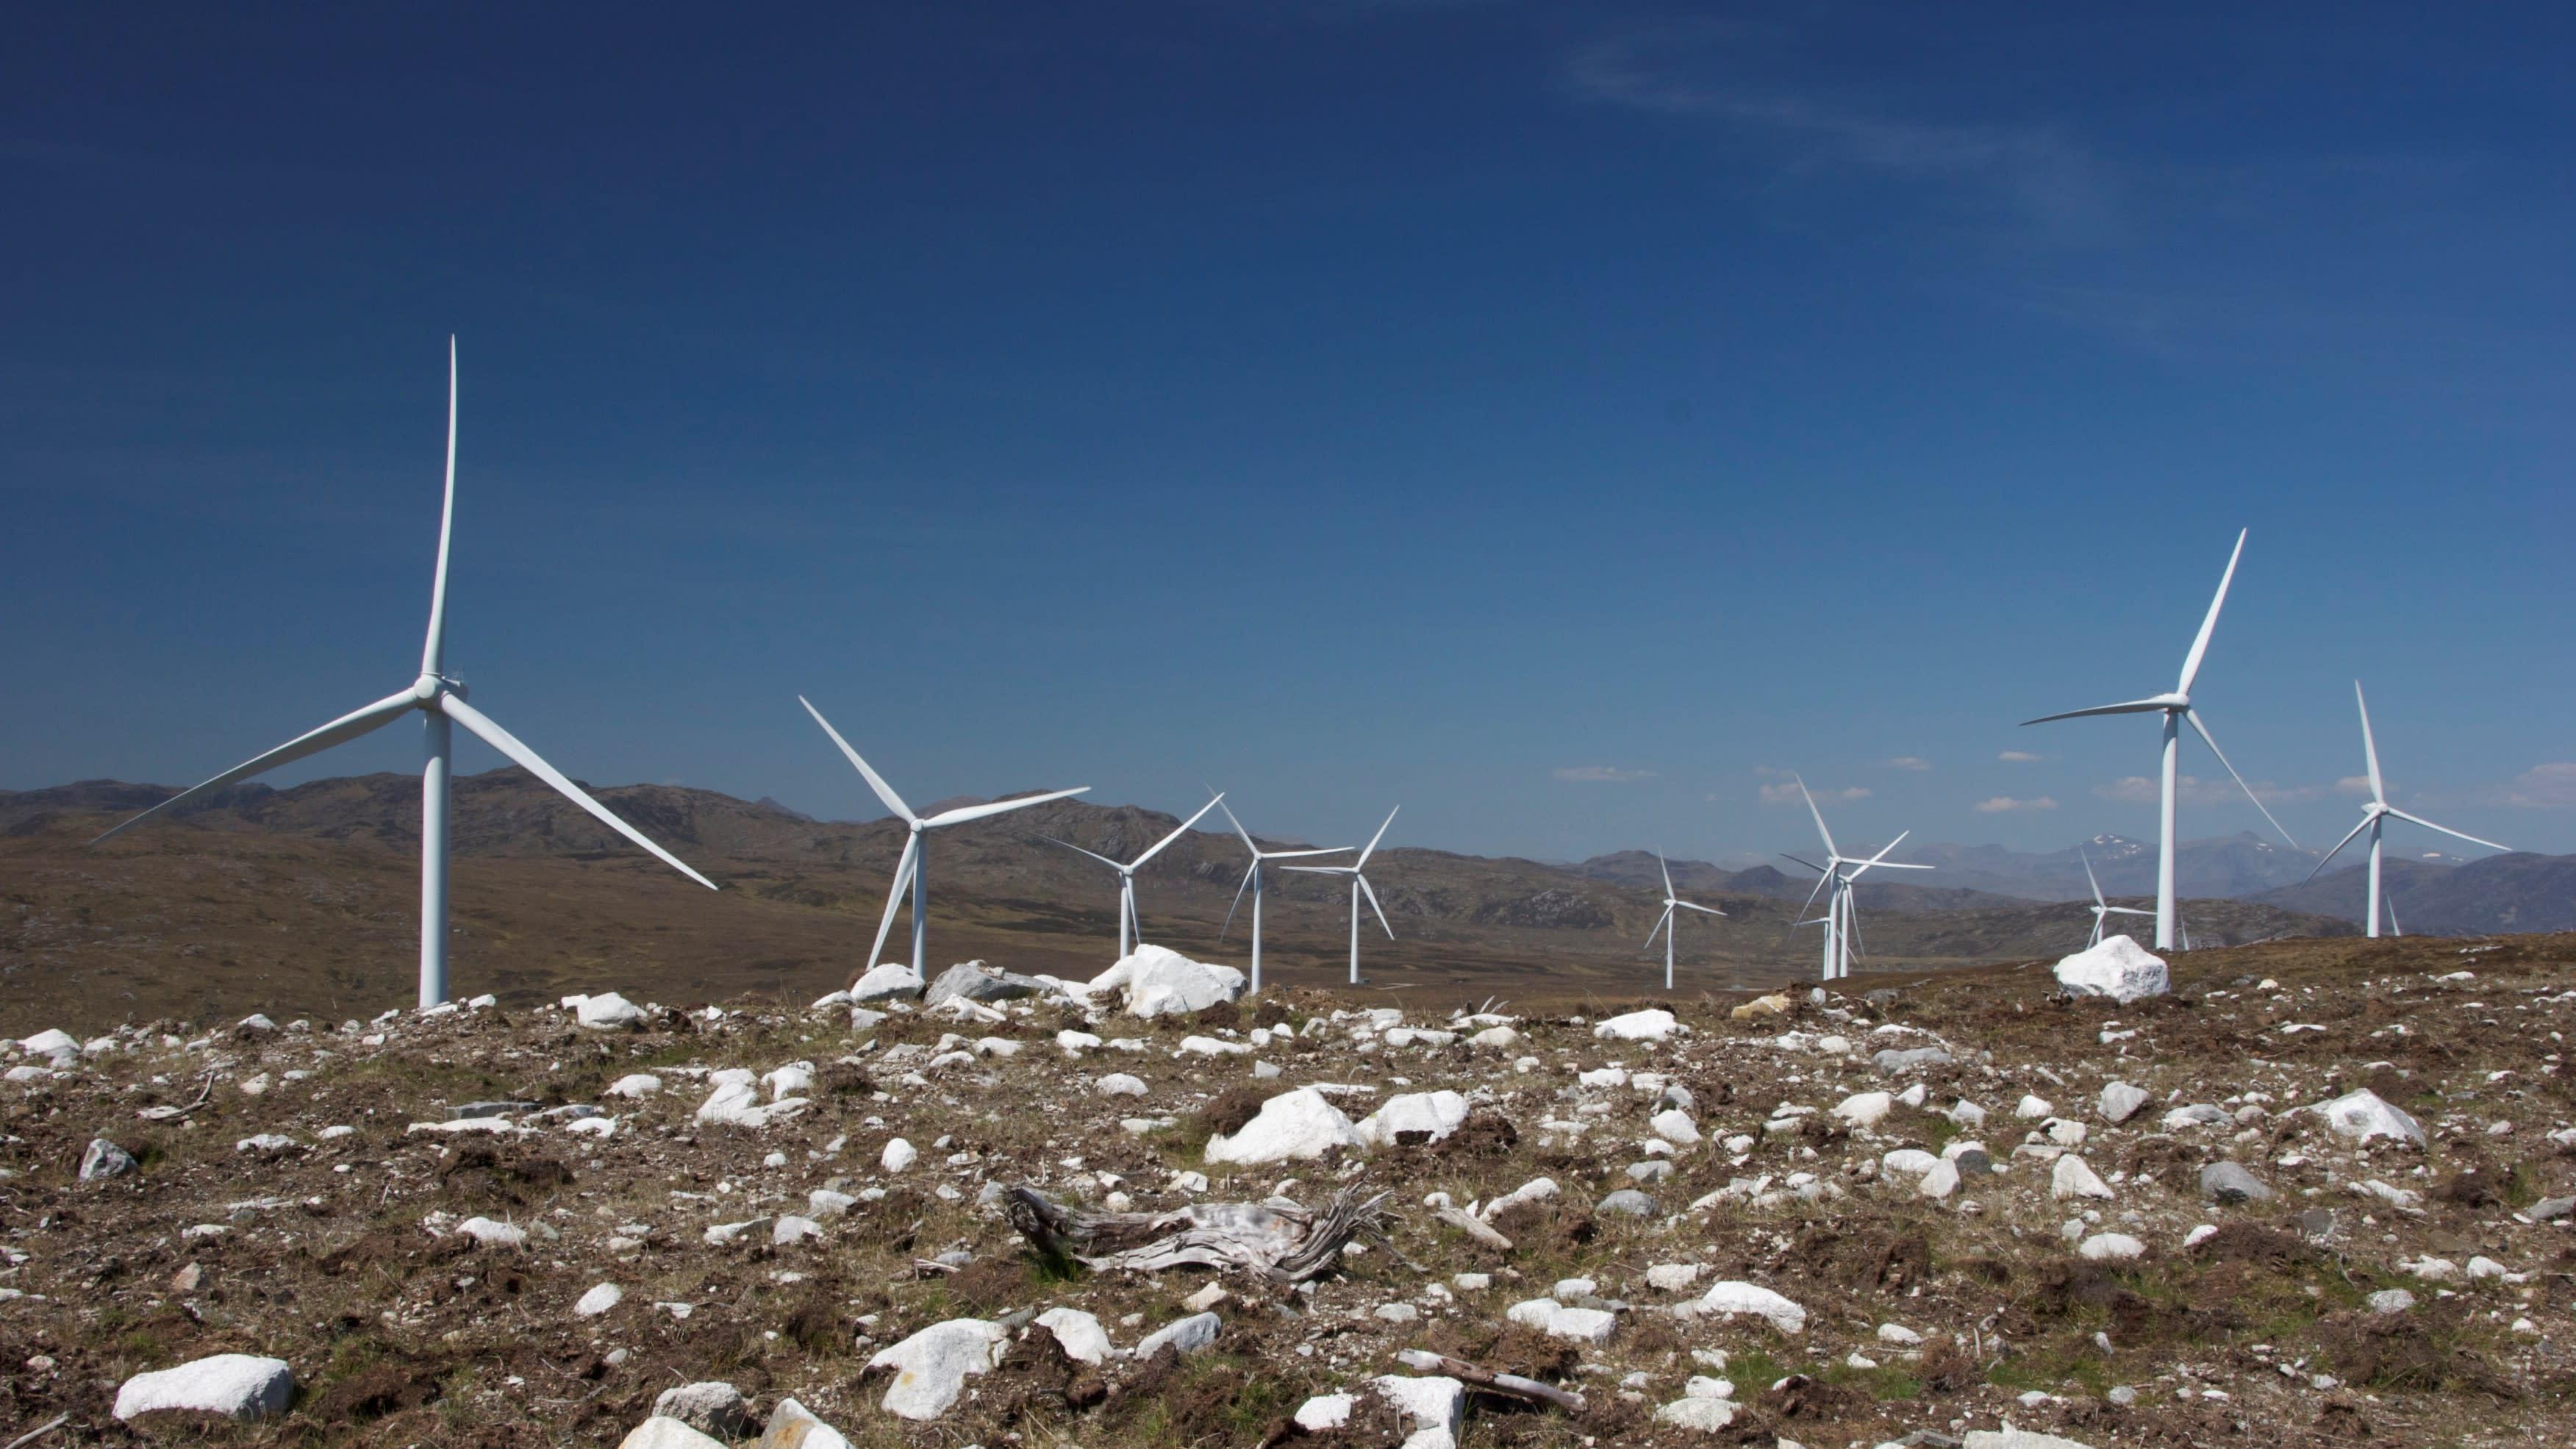 Fairburn wind farm